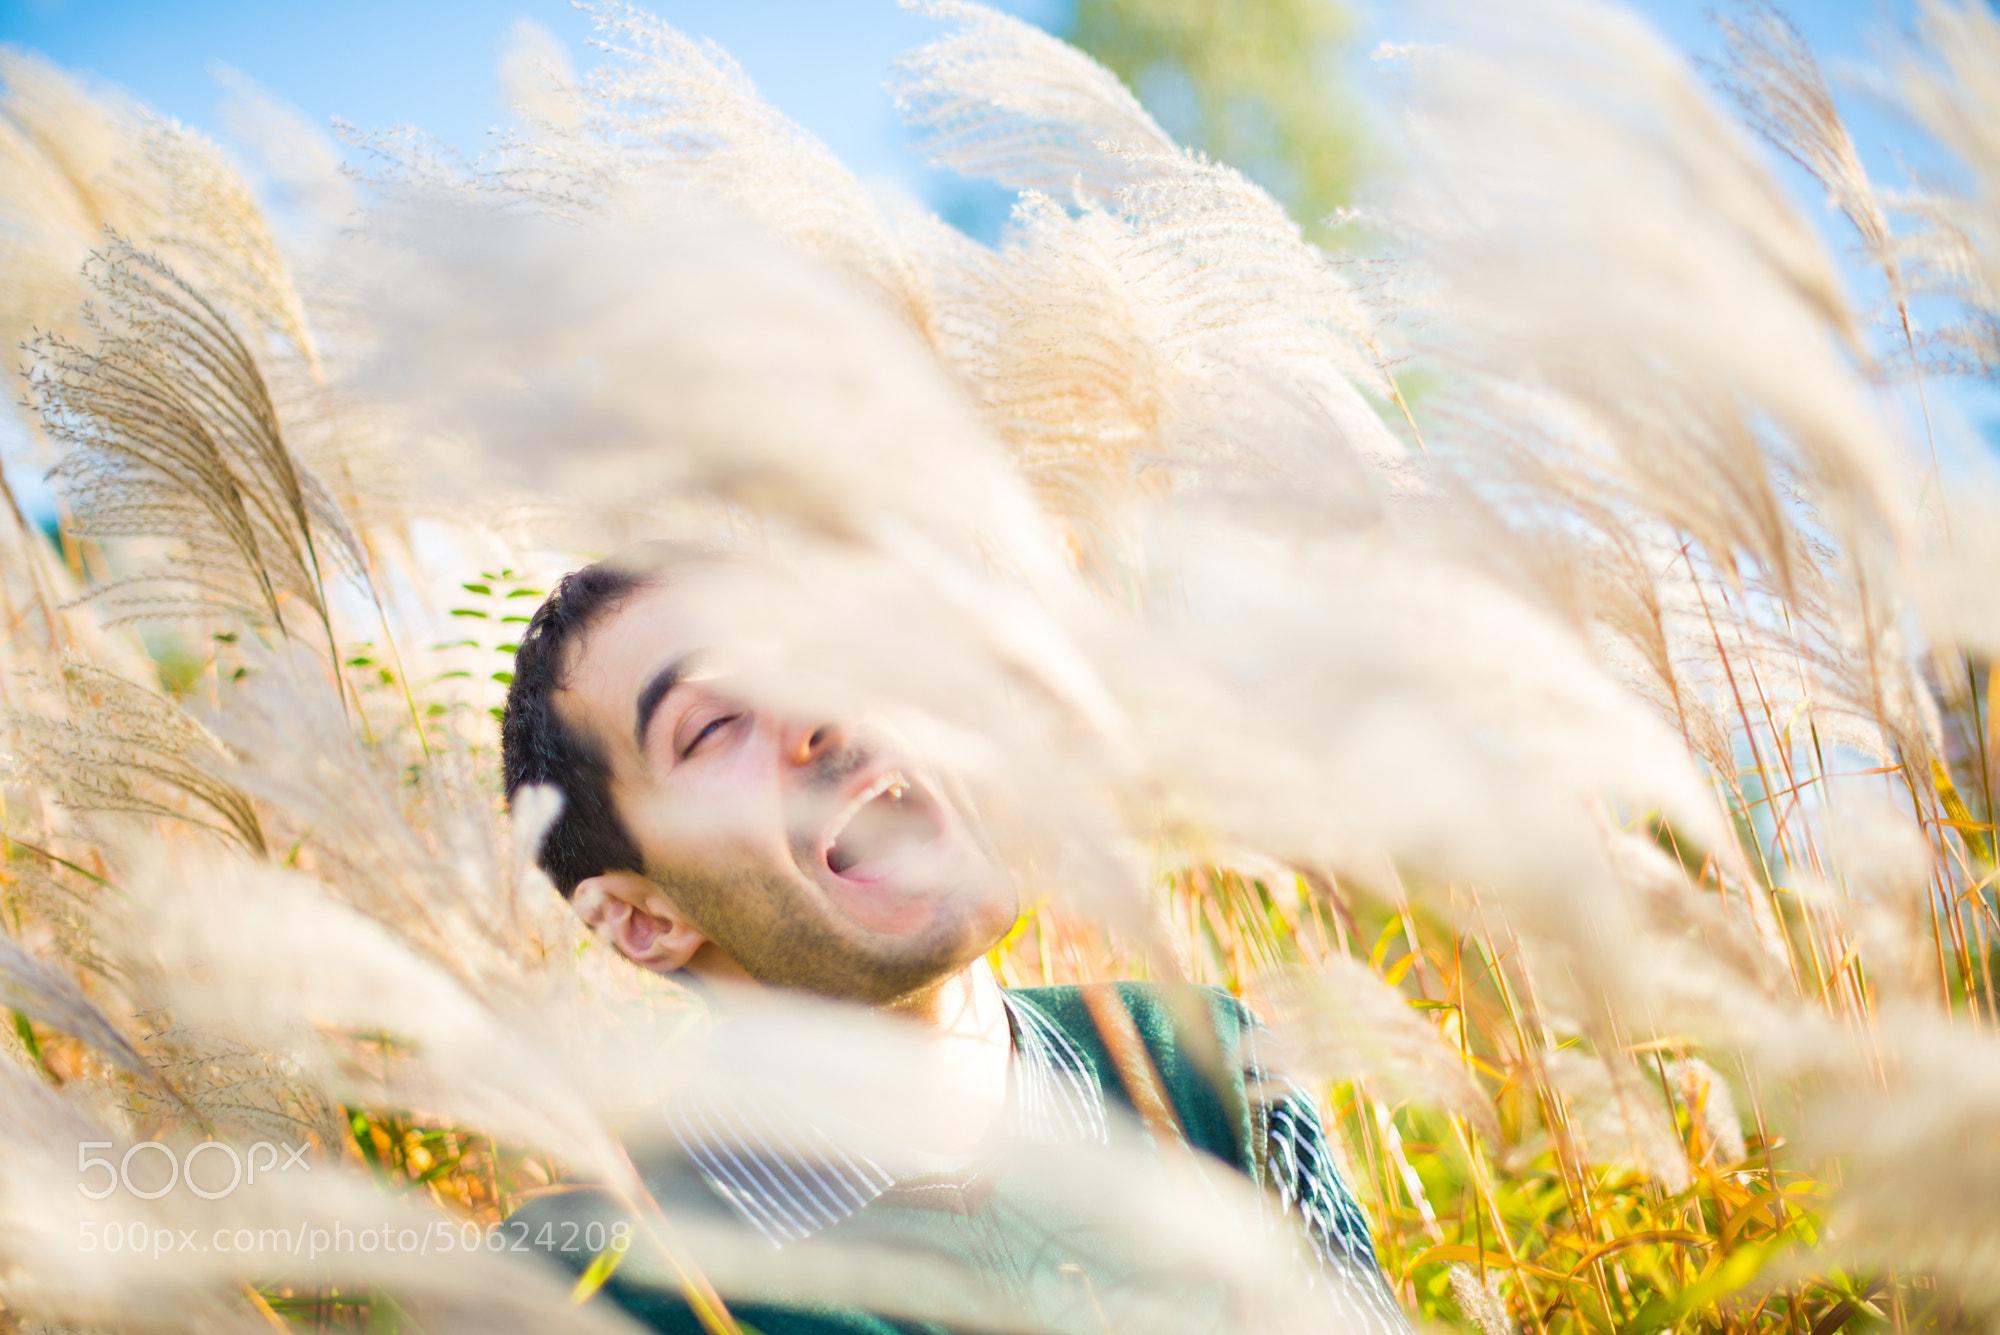 Photograph Autumn mood by Maryana Lemak on 500px